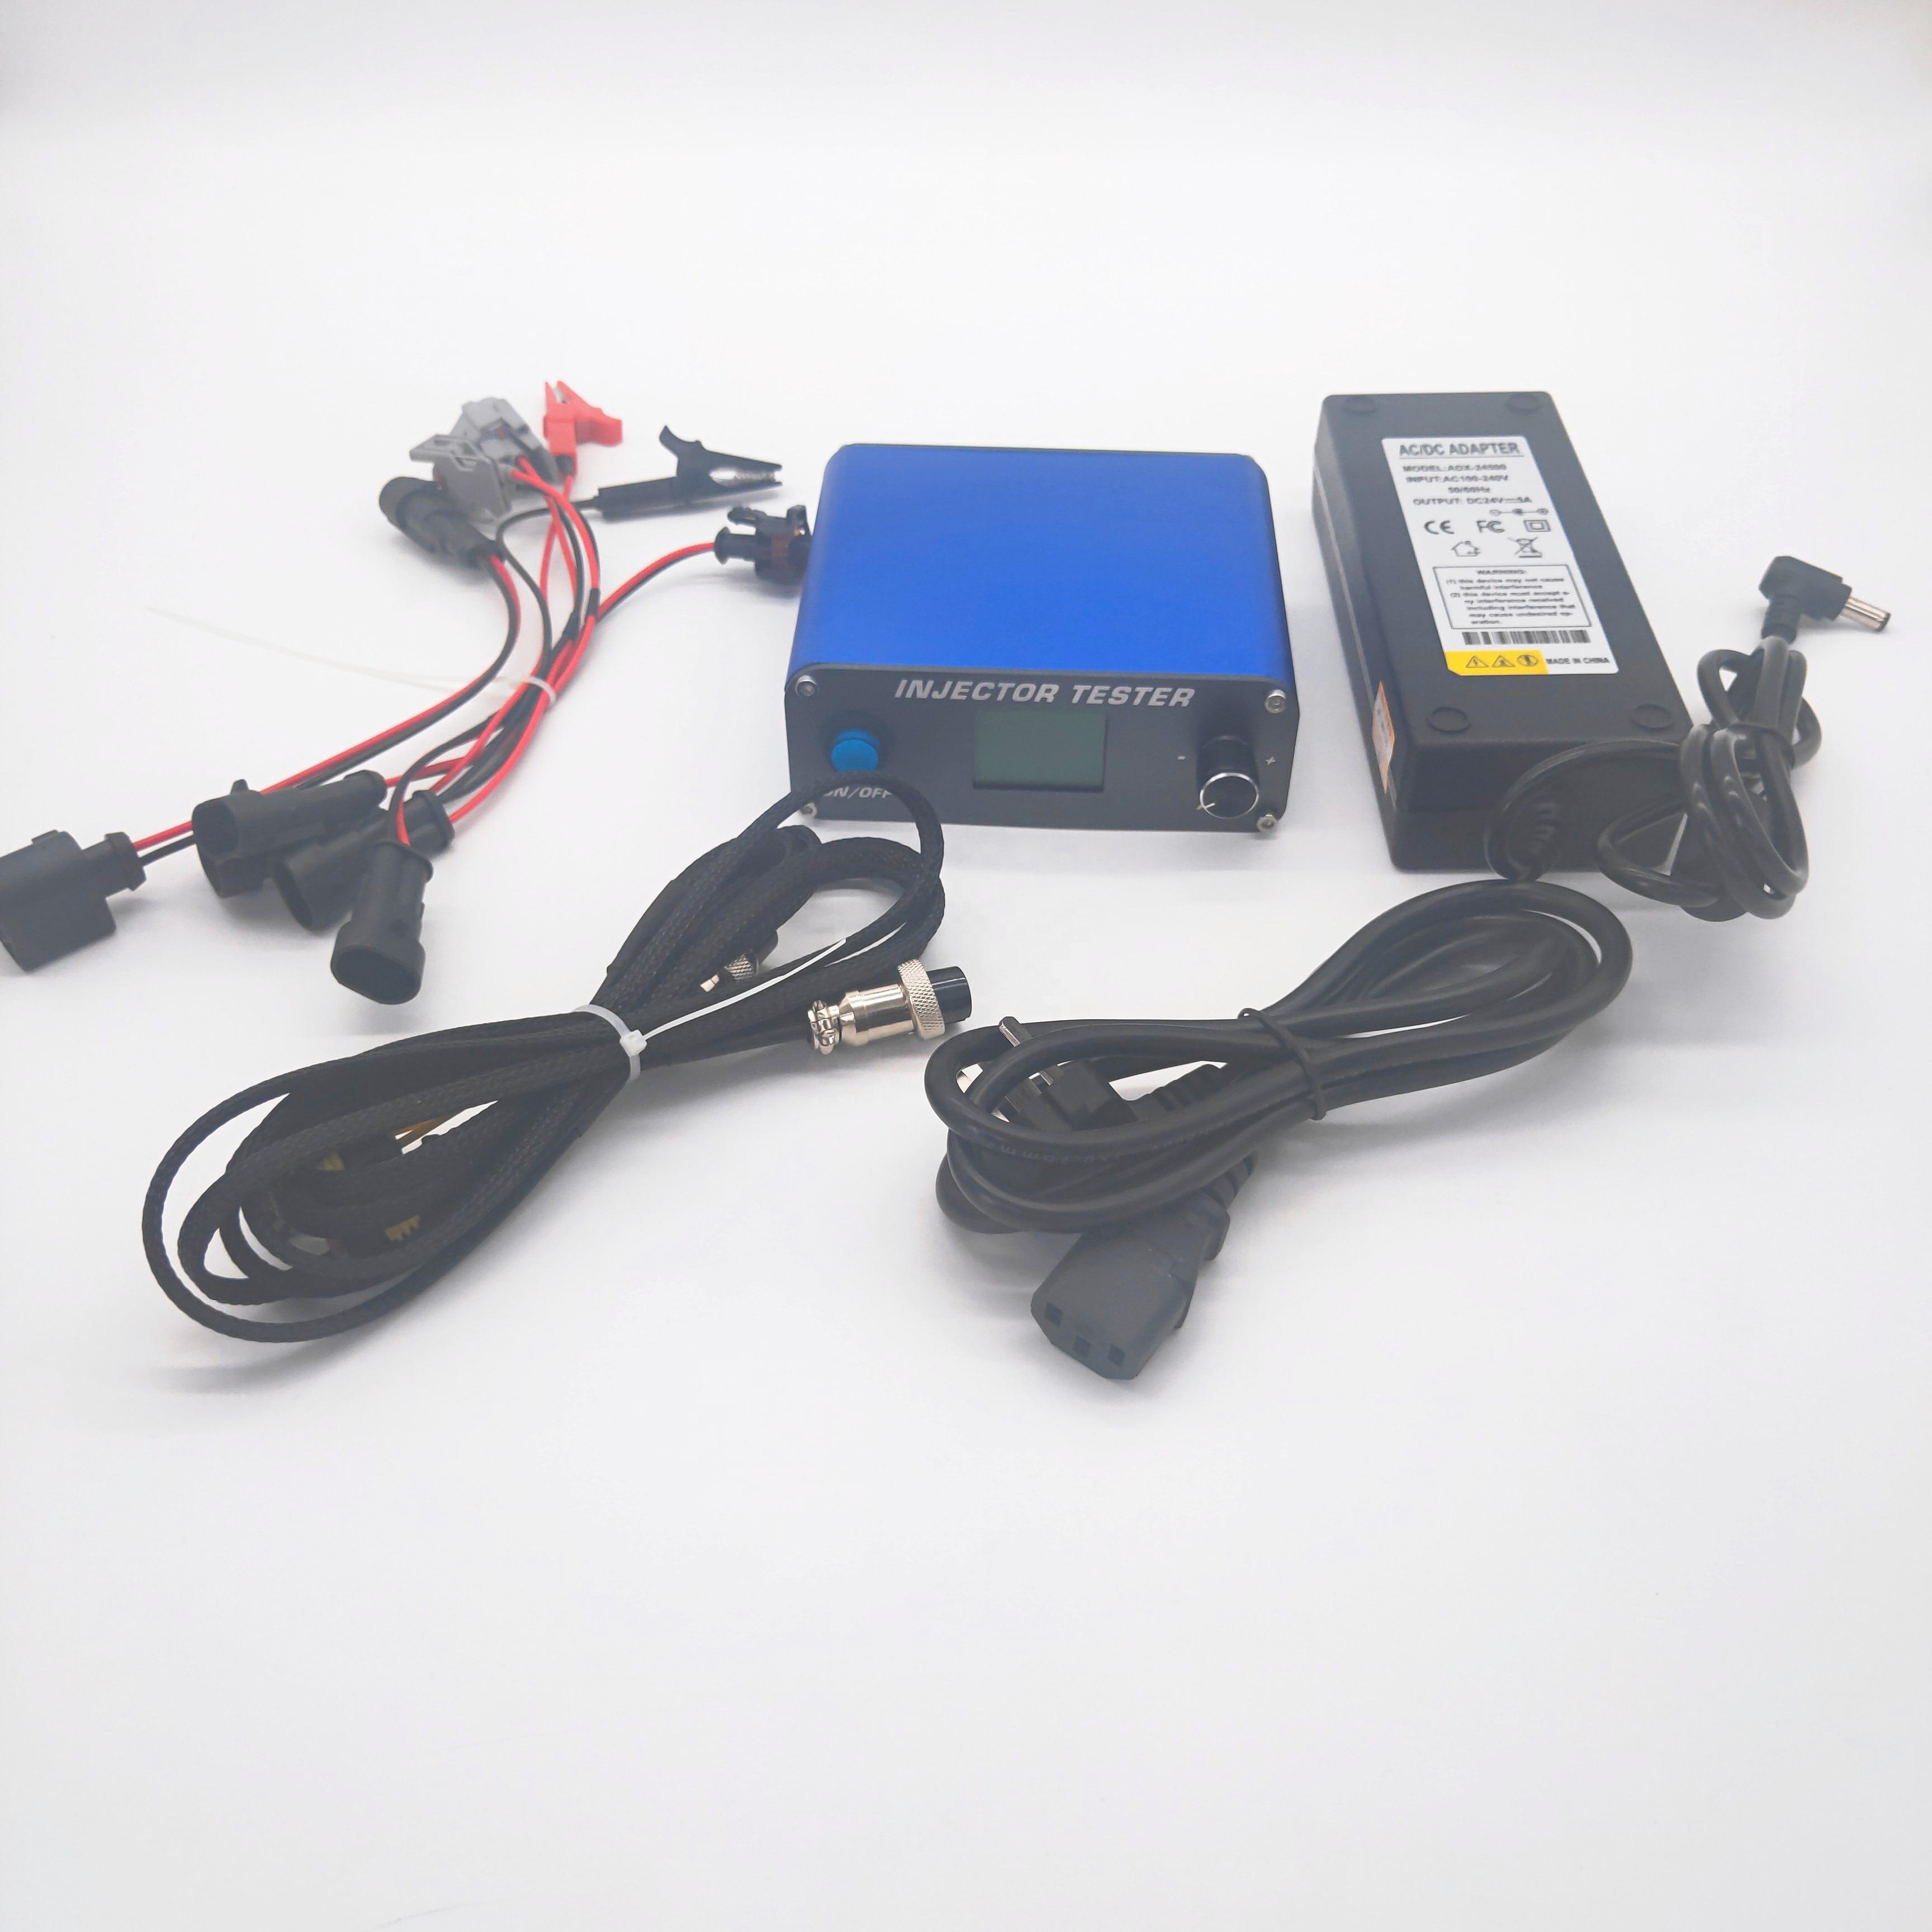 NANTAI gran oferta CR1000A probador de inyectores Diesel probador de inyectores CRDI